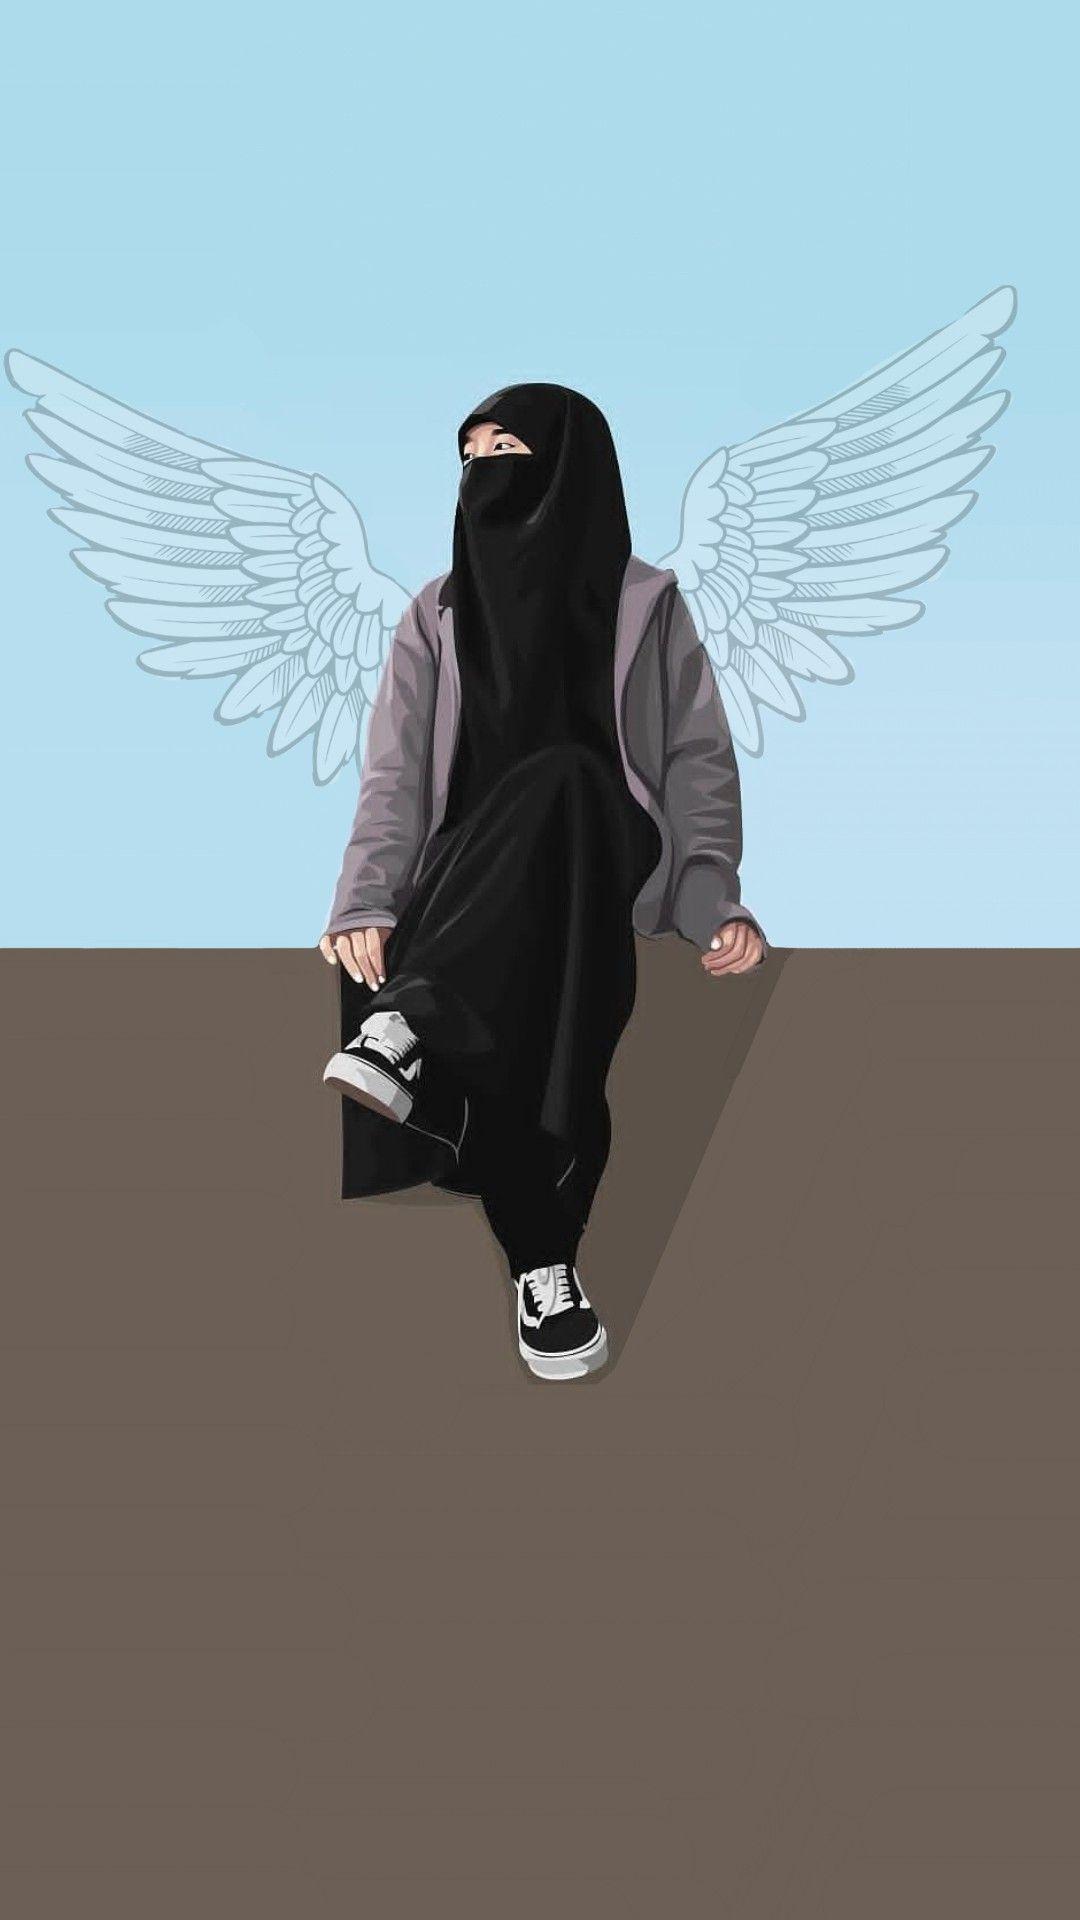 Anime Cute Wallpapers For Girls Hijab Novocom Top